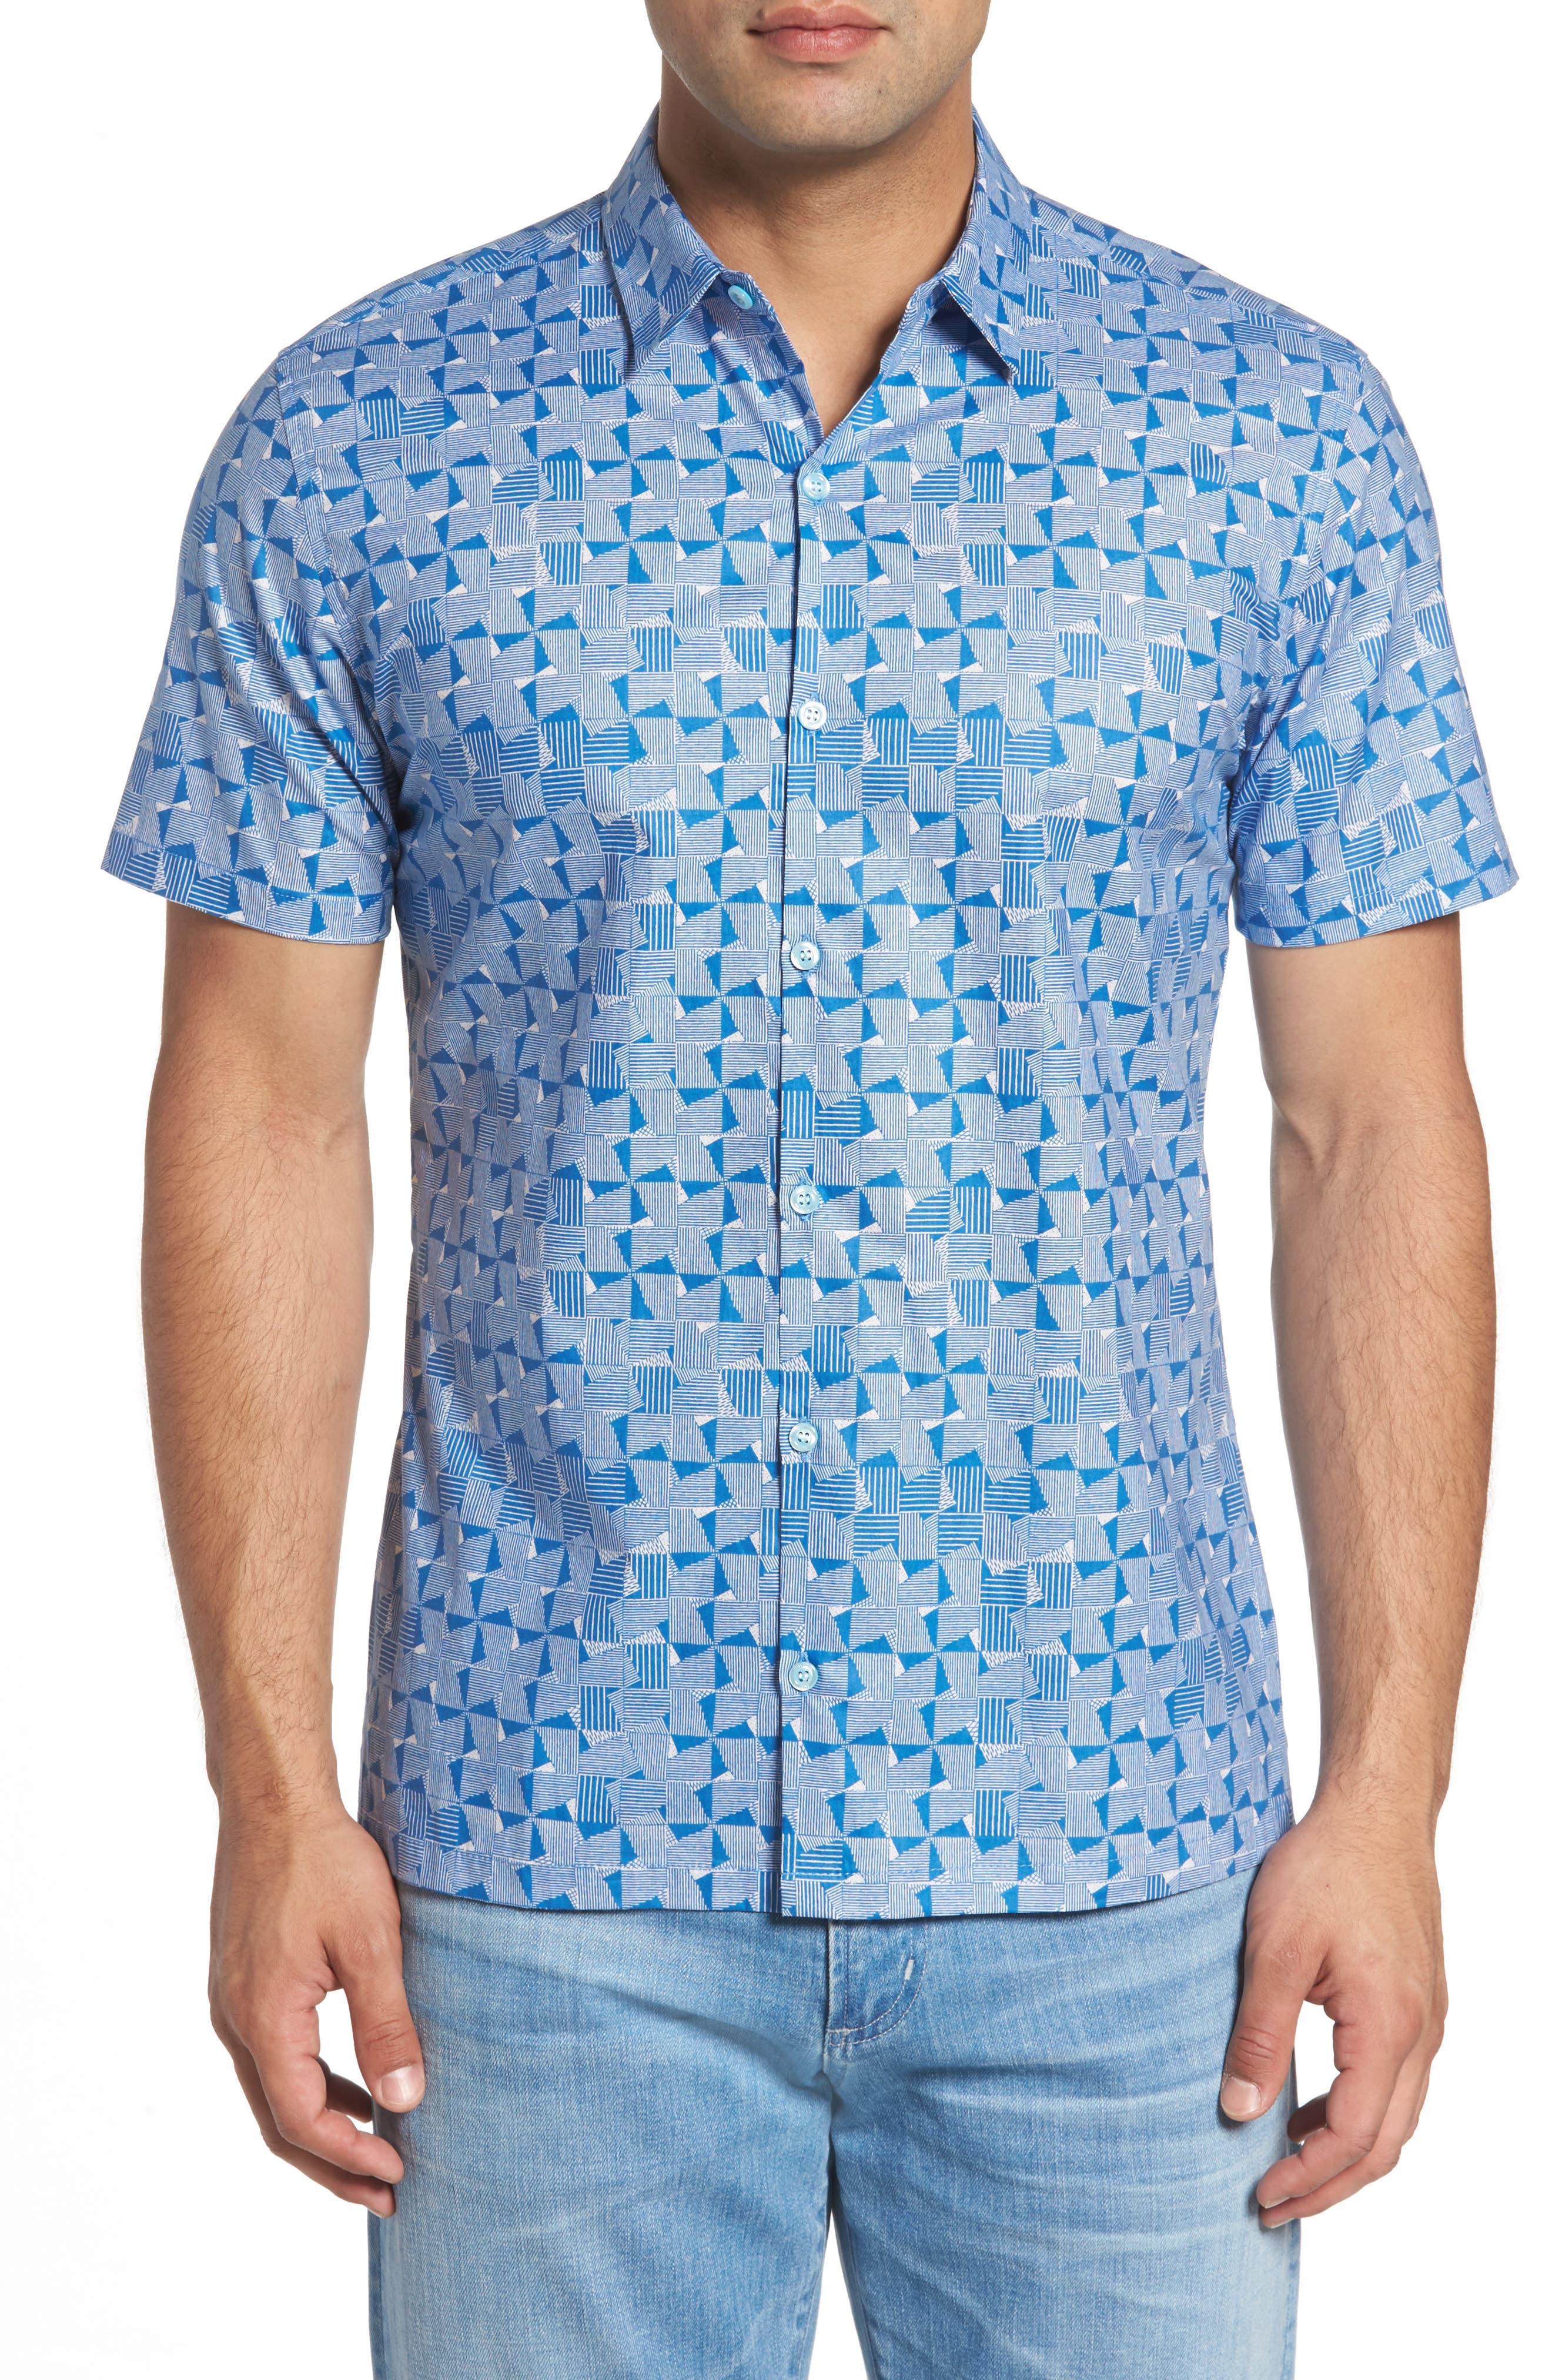 Tori Richard Maunulua Kapa Slim Fit Camp Shirt